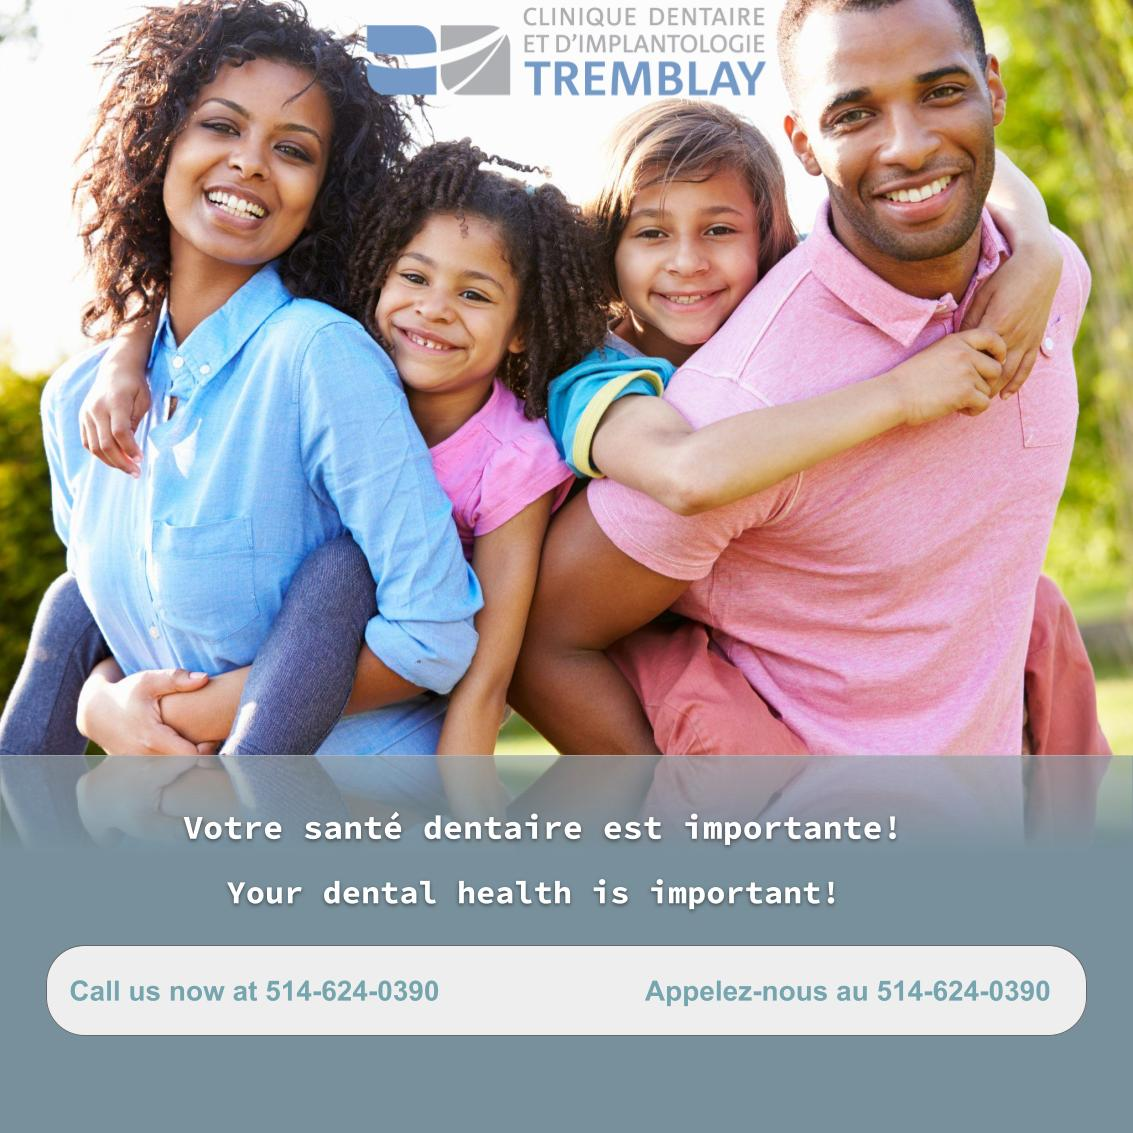 Promotion for dental prevention